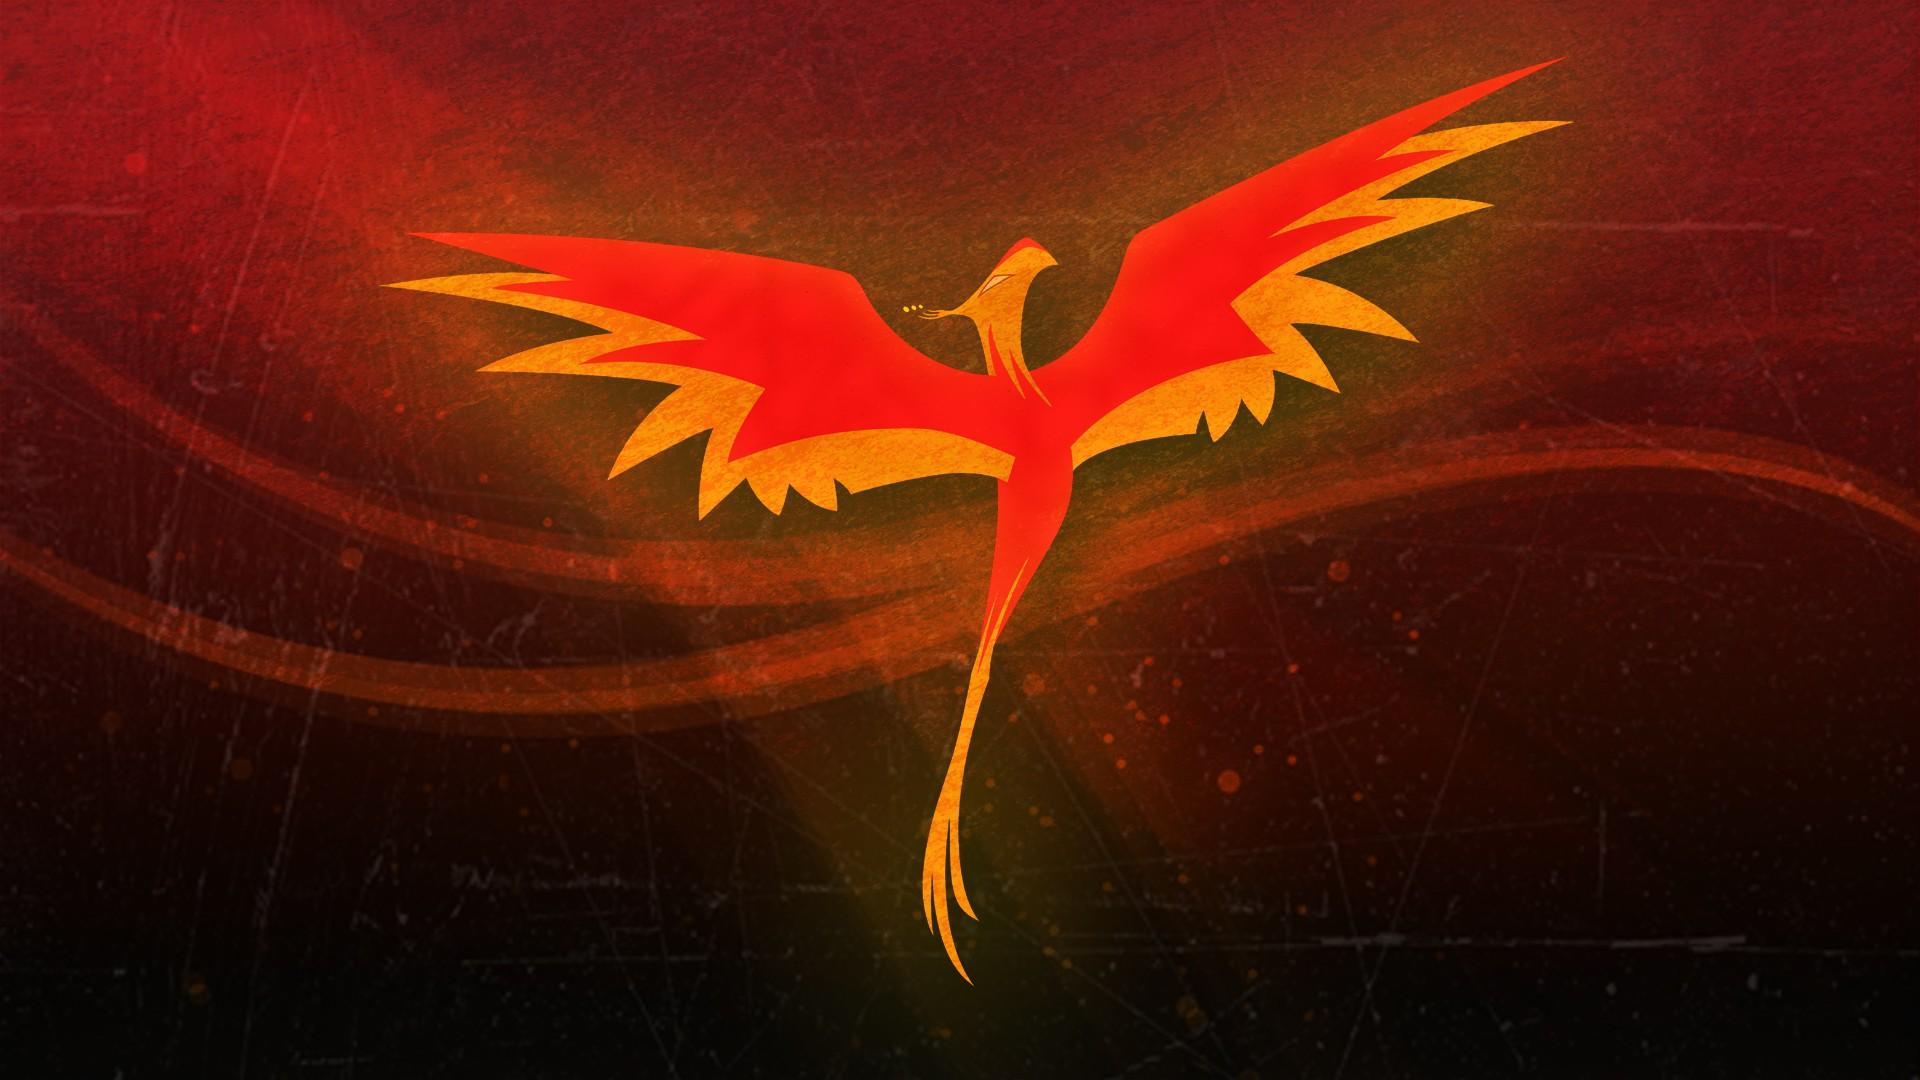 71 phoenix bird wallpaper on wallpapersafari